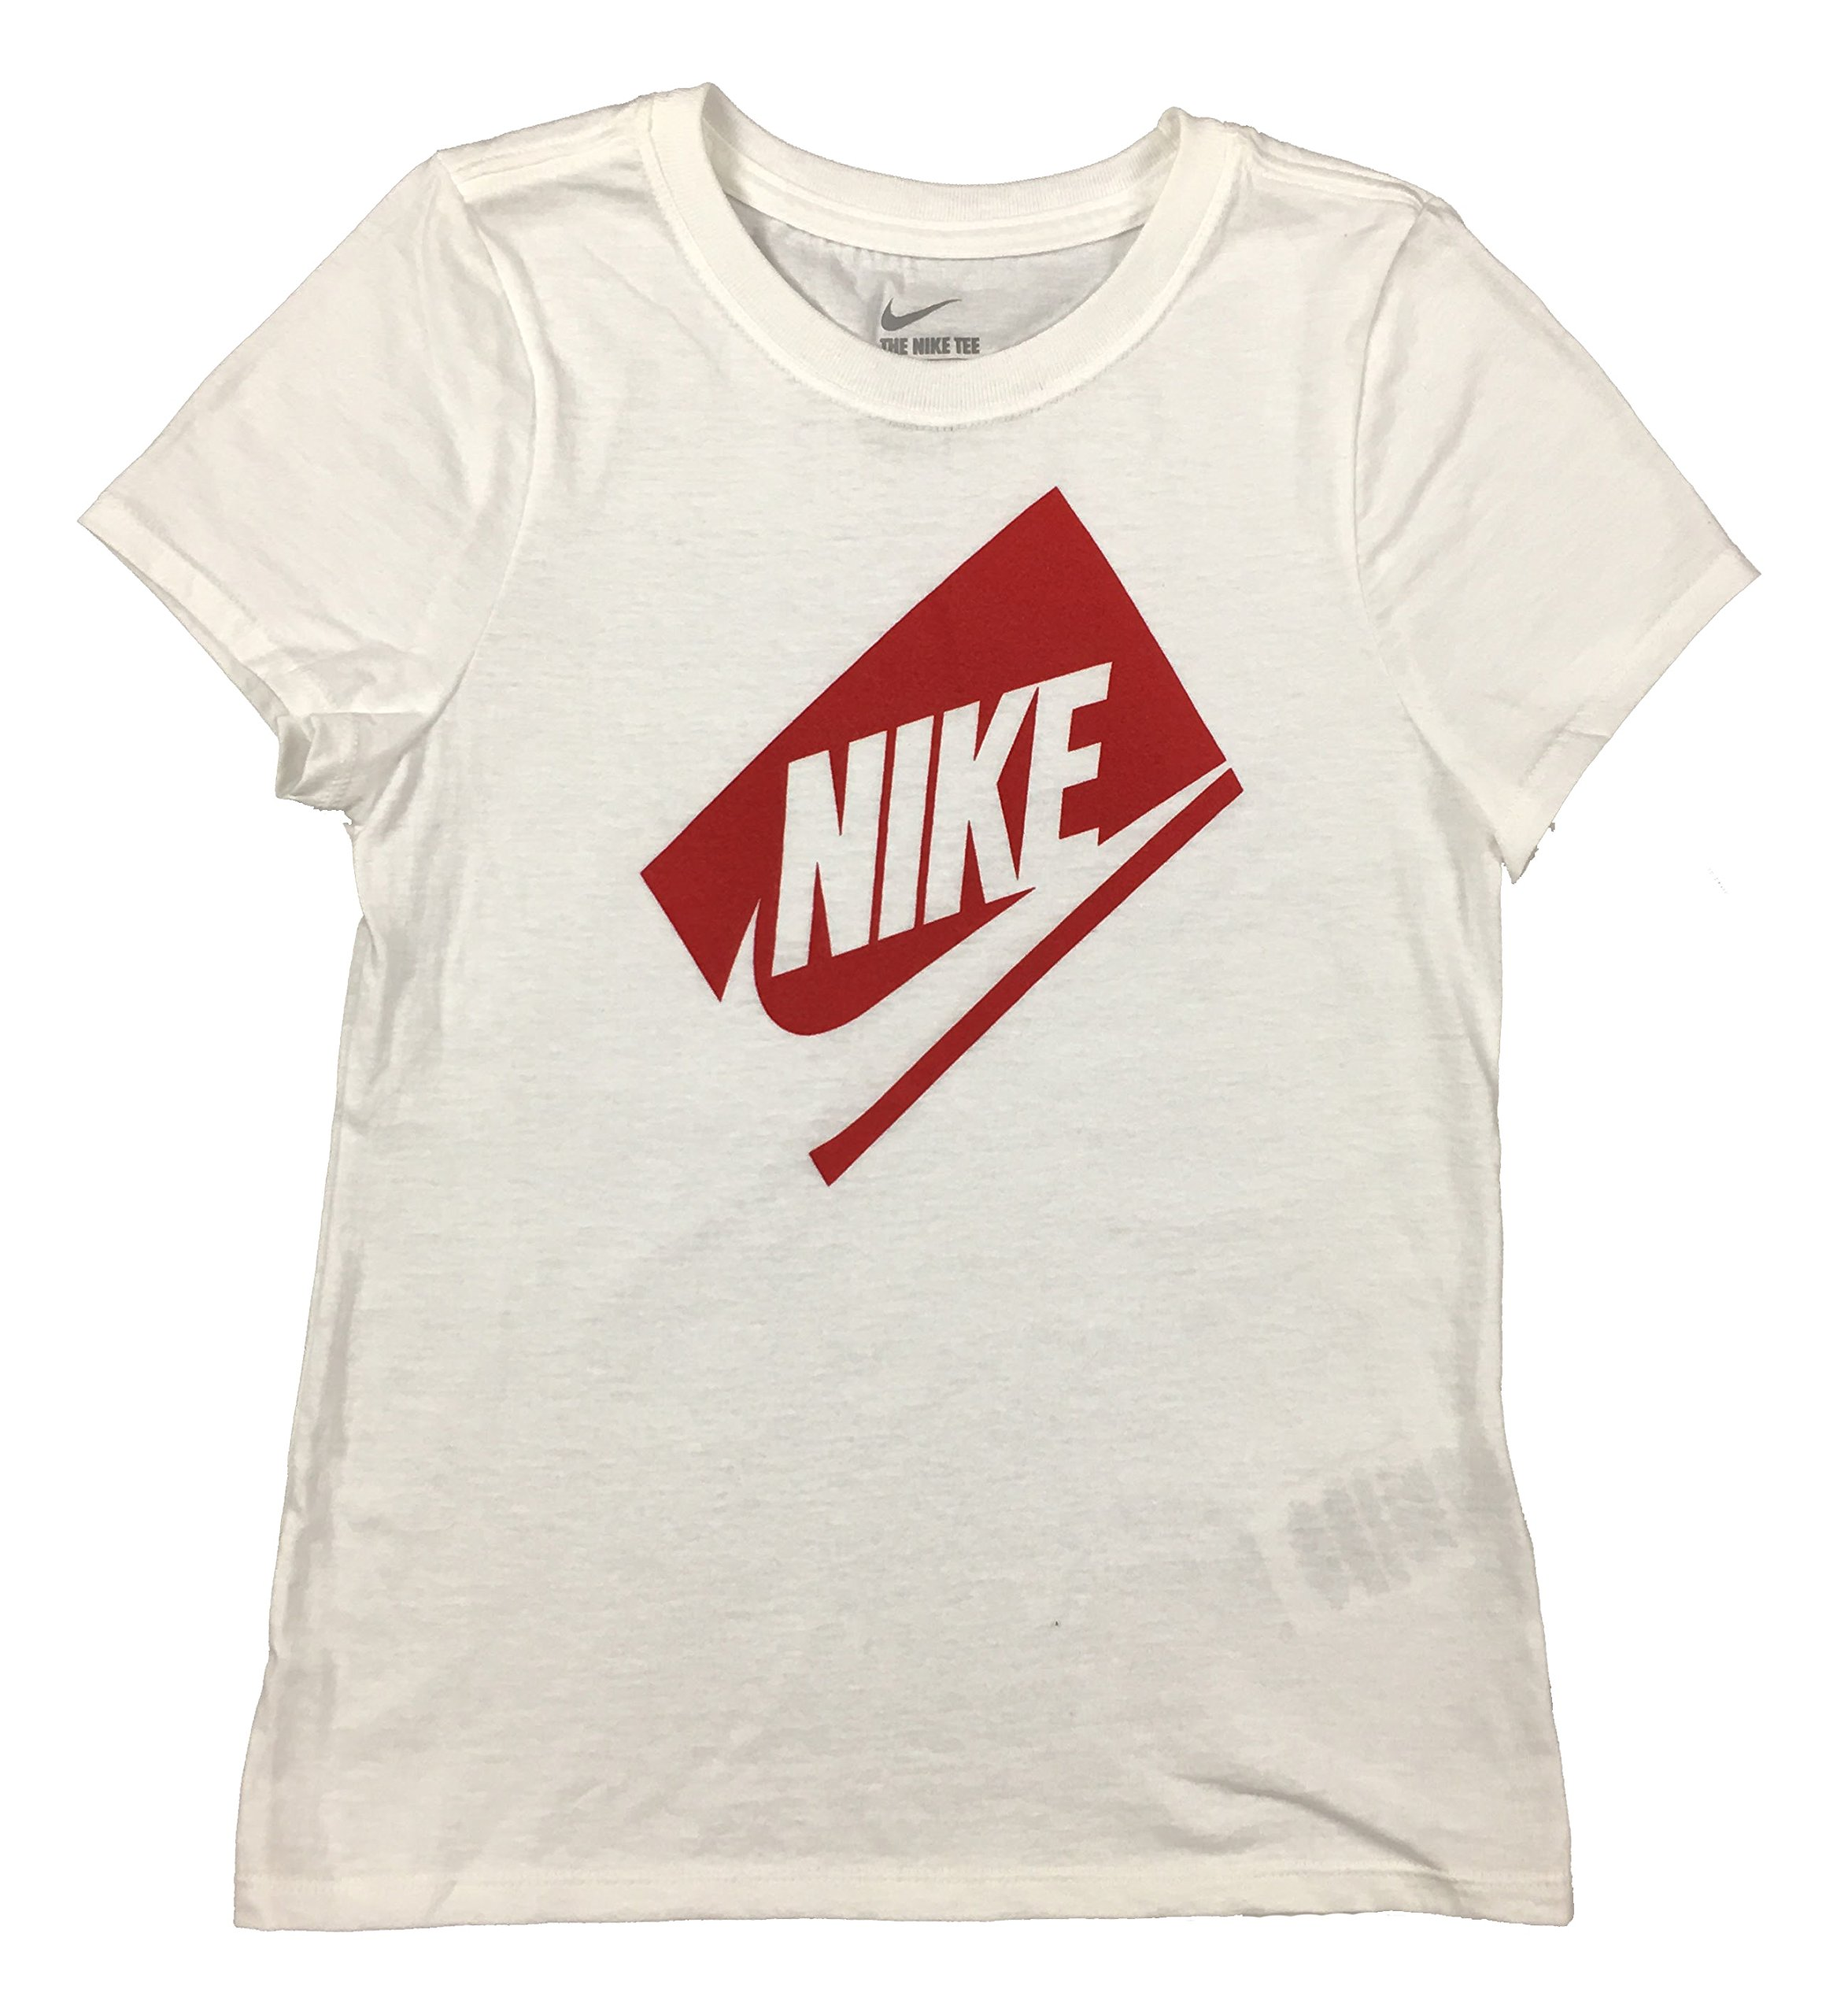 Nike Girls Swoosh Box Futura T-Shirt AA2150 100 Small by NIKE